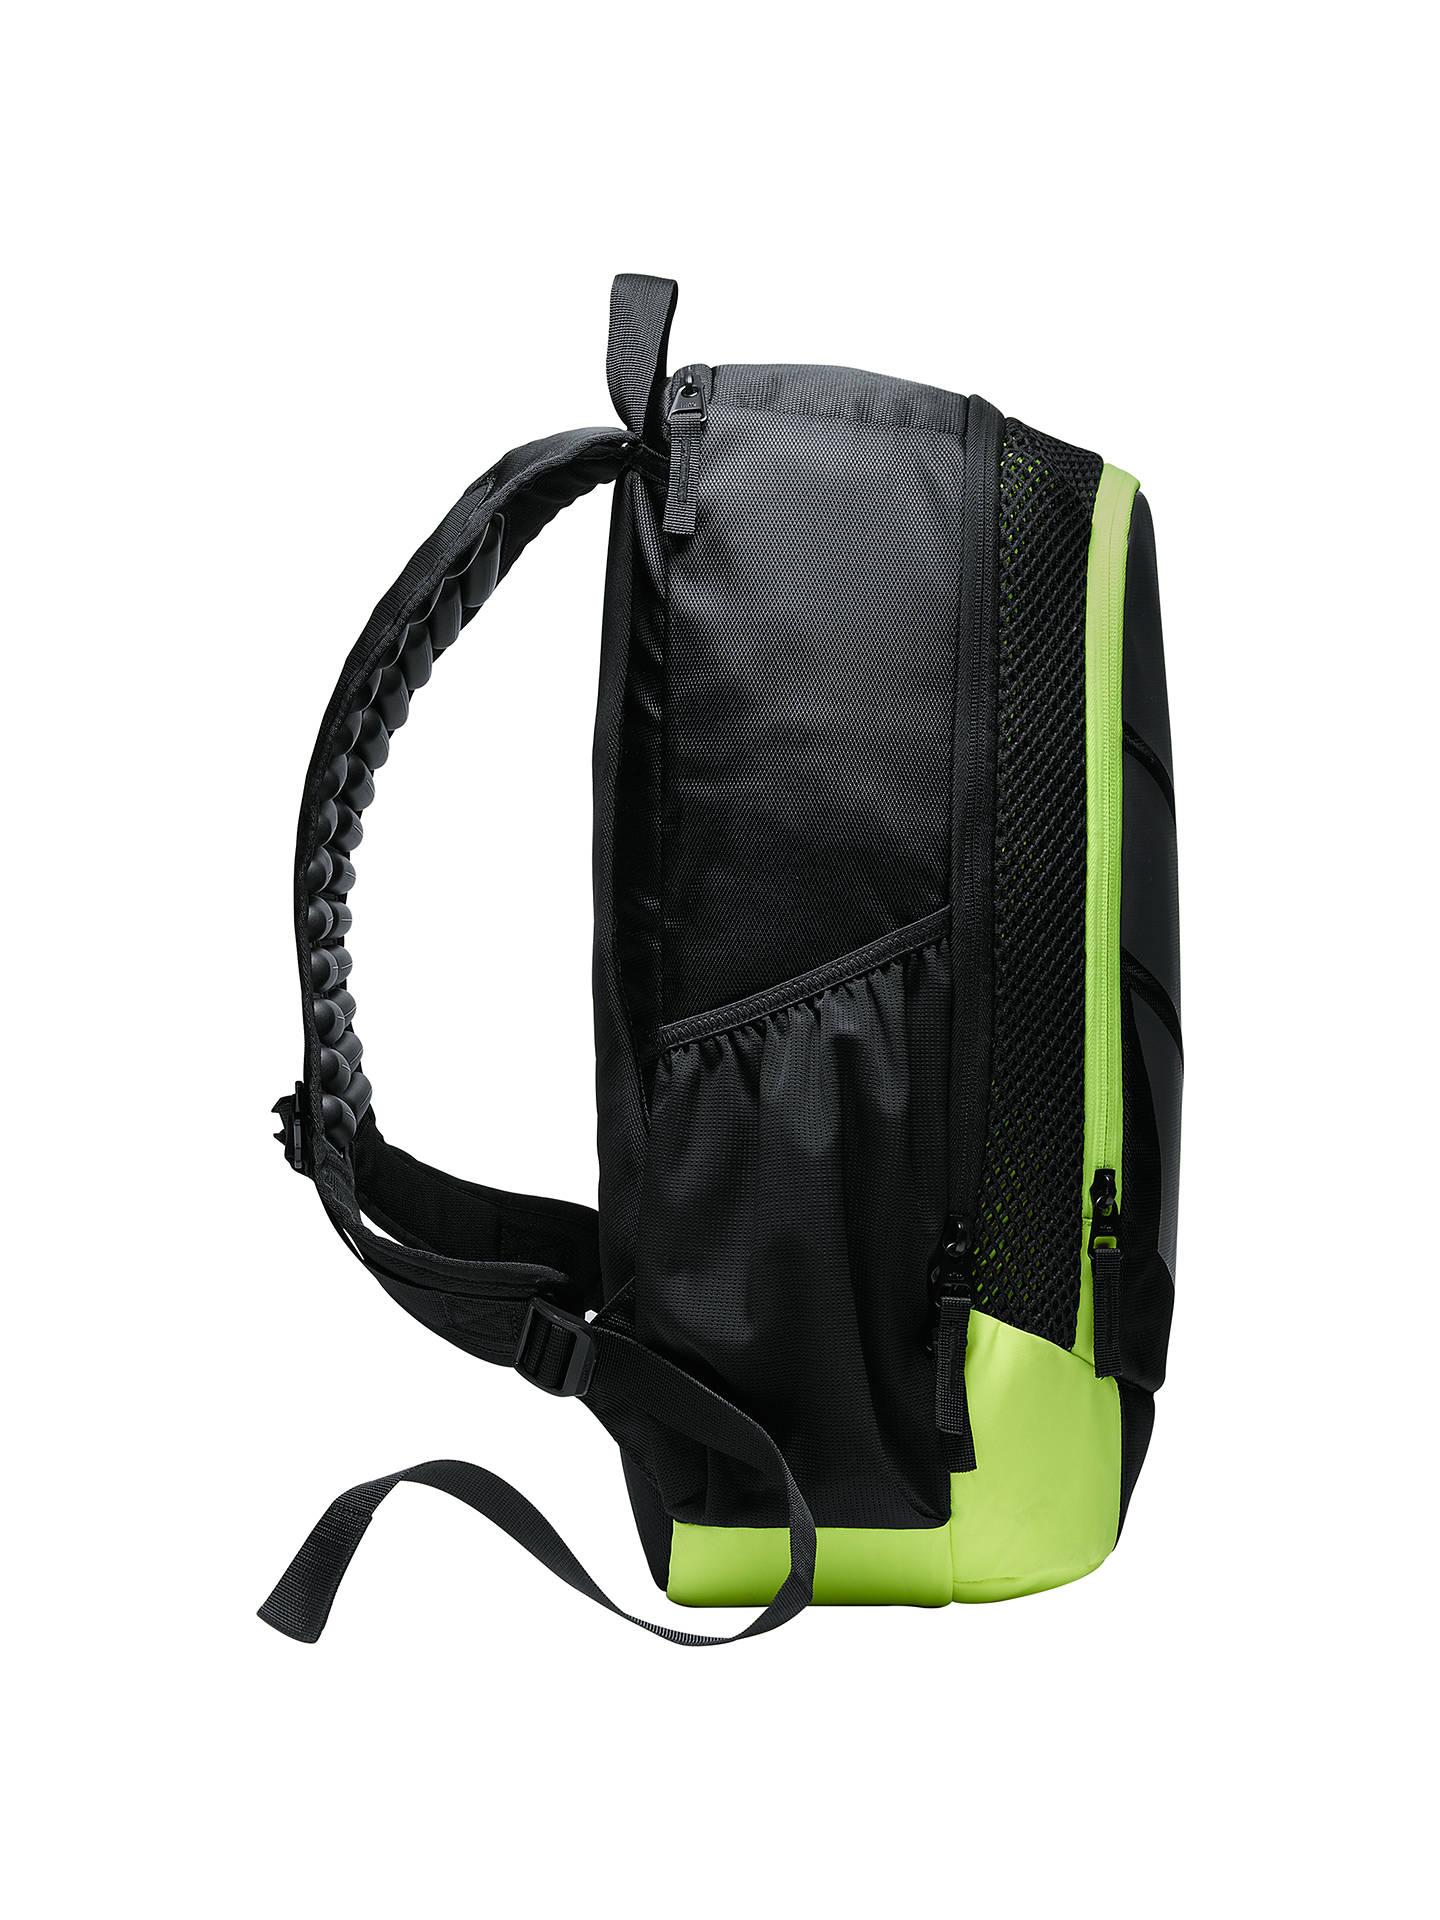 Nike Vapor Speed Training Backpack Nike Vapor Speed Max Air  138e7c9737677